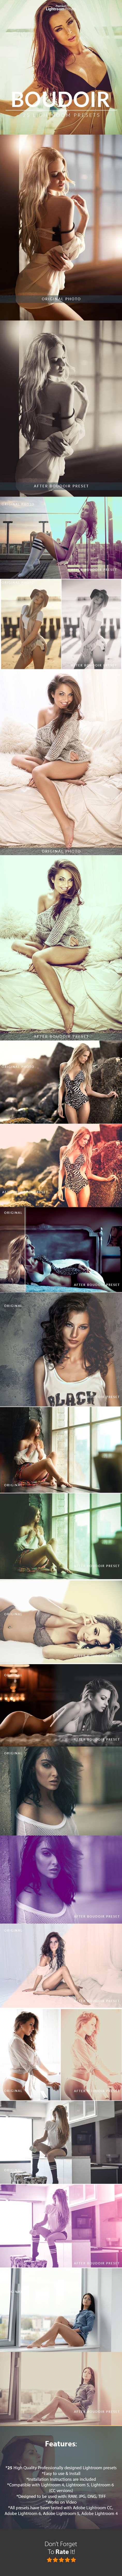 GraphicRiver Boudoir Premium Lightroom Presets 20413399